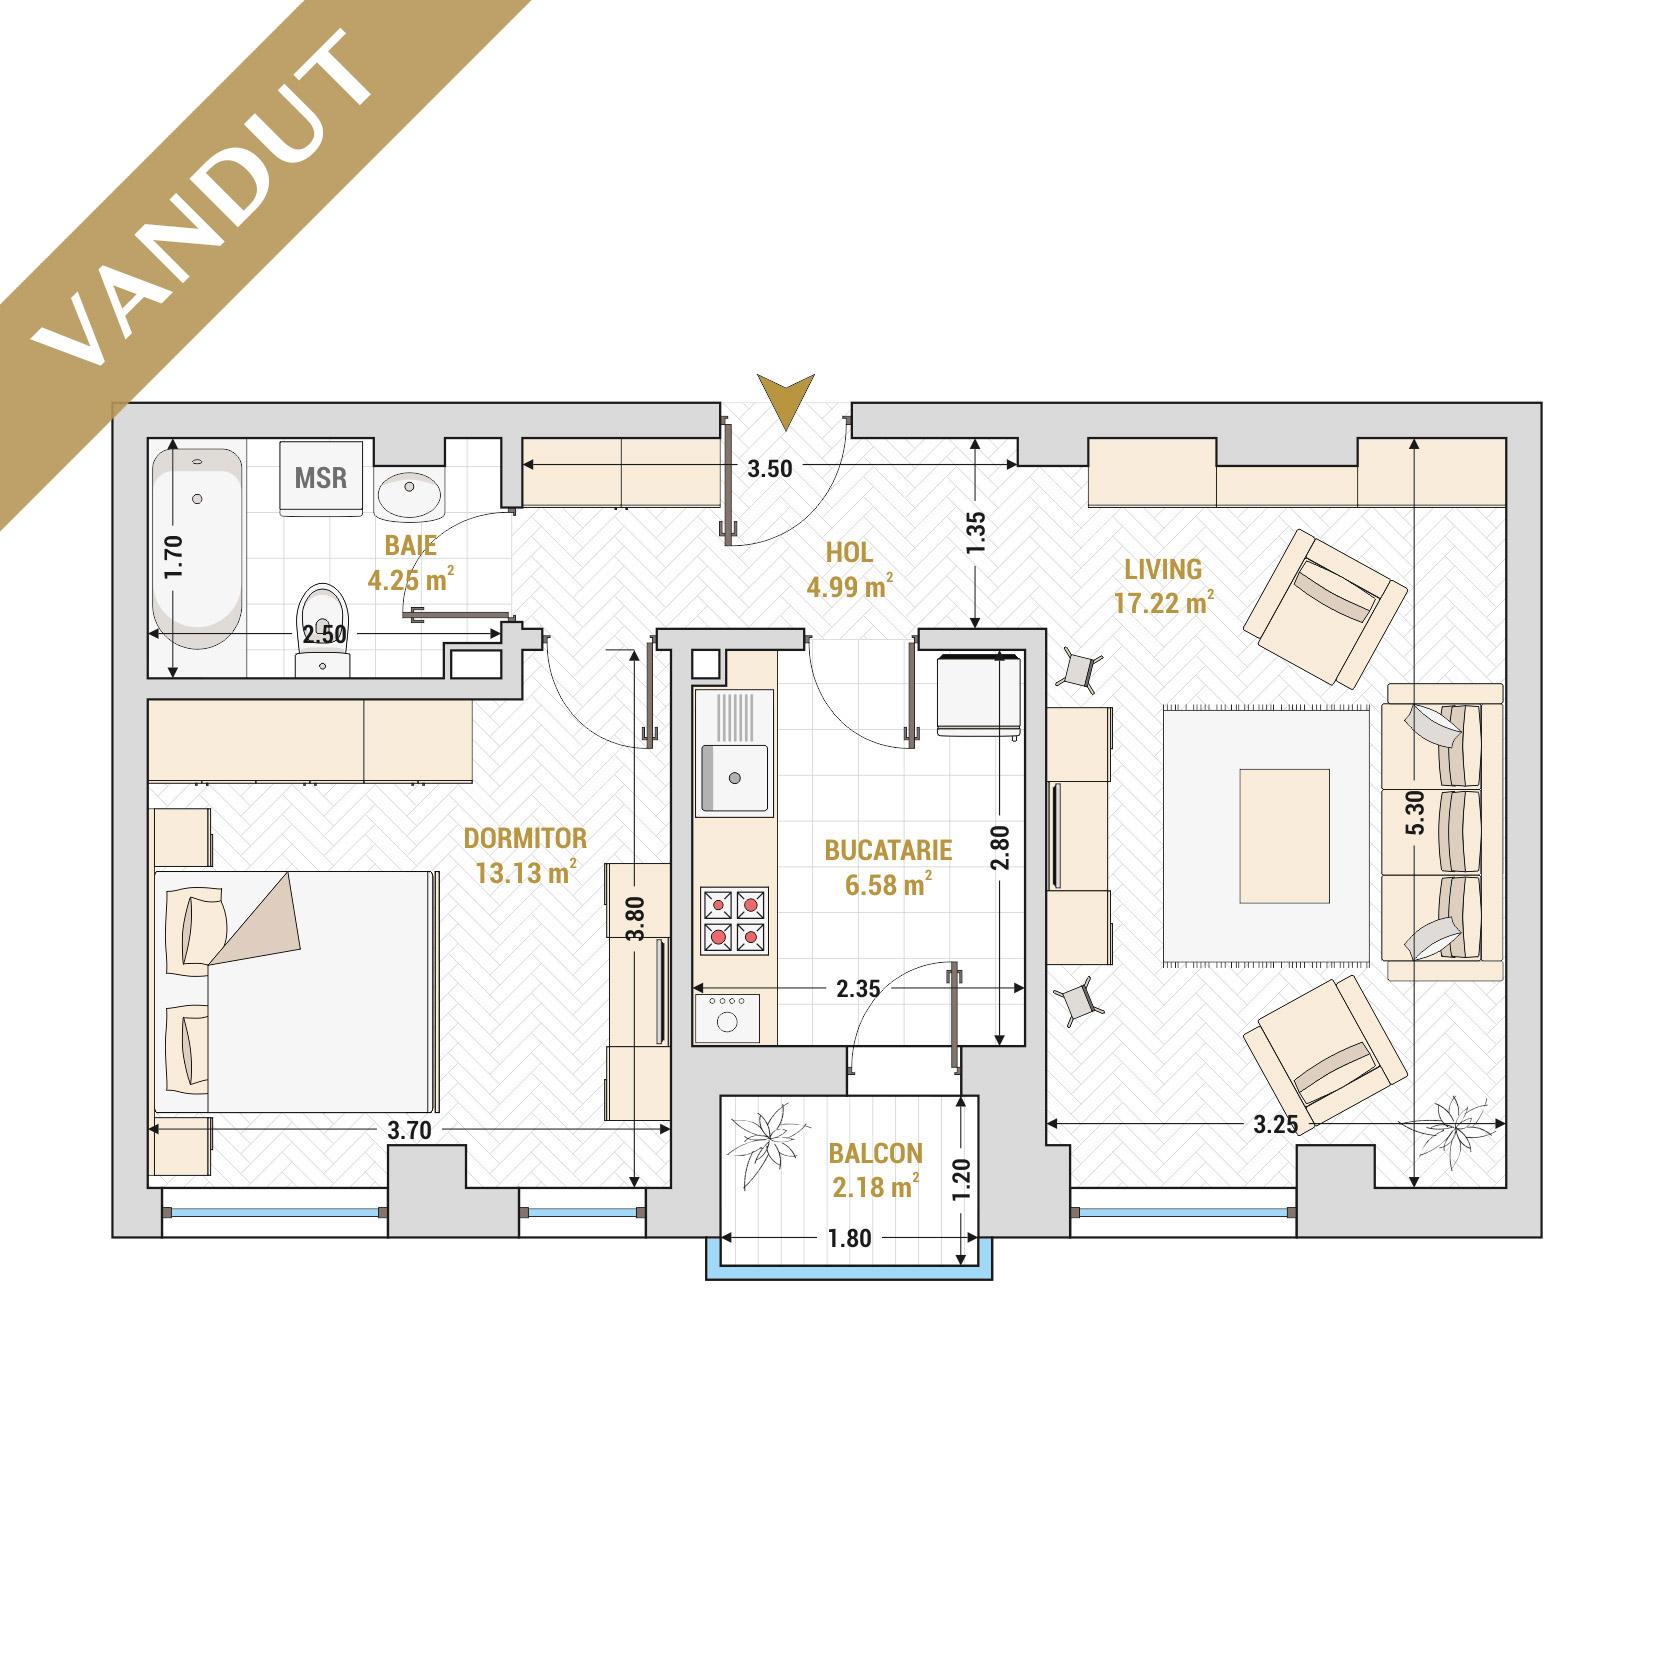 Apartament 2 camere de vanzare Bucuresti - Catedral Residence - Marriott, Piata Unirii, 13 Septembrie, Izvor - Tip 1 - T2 - V